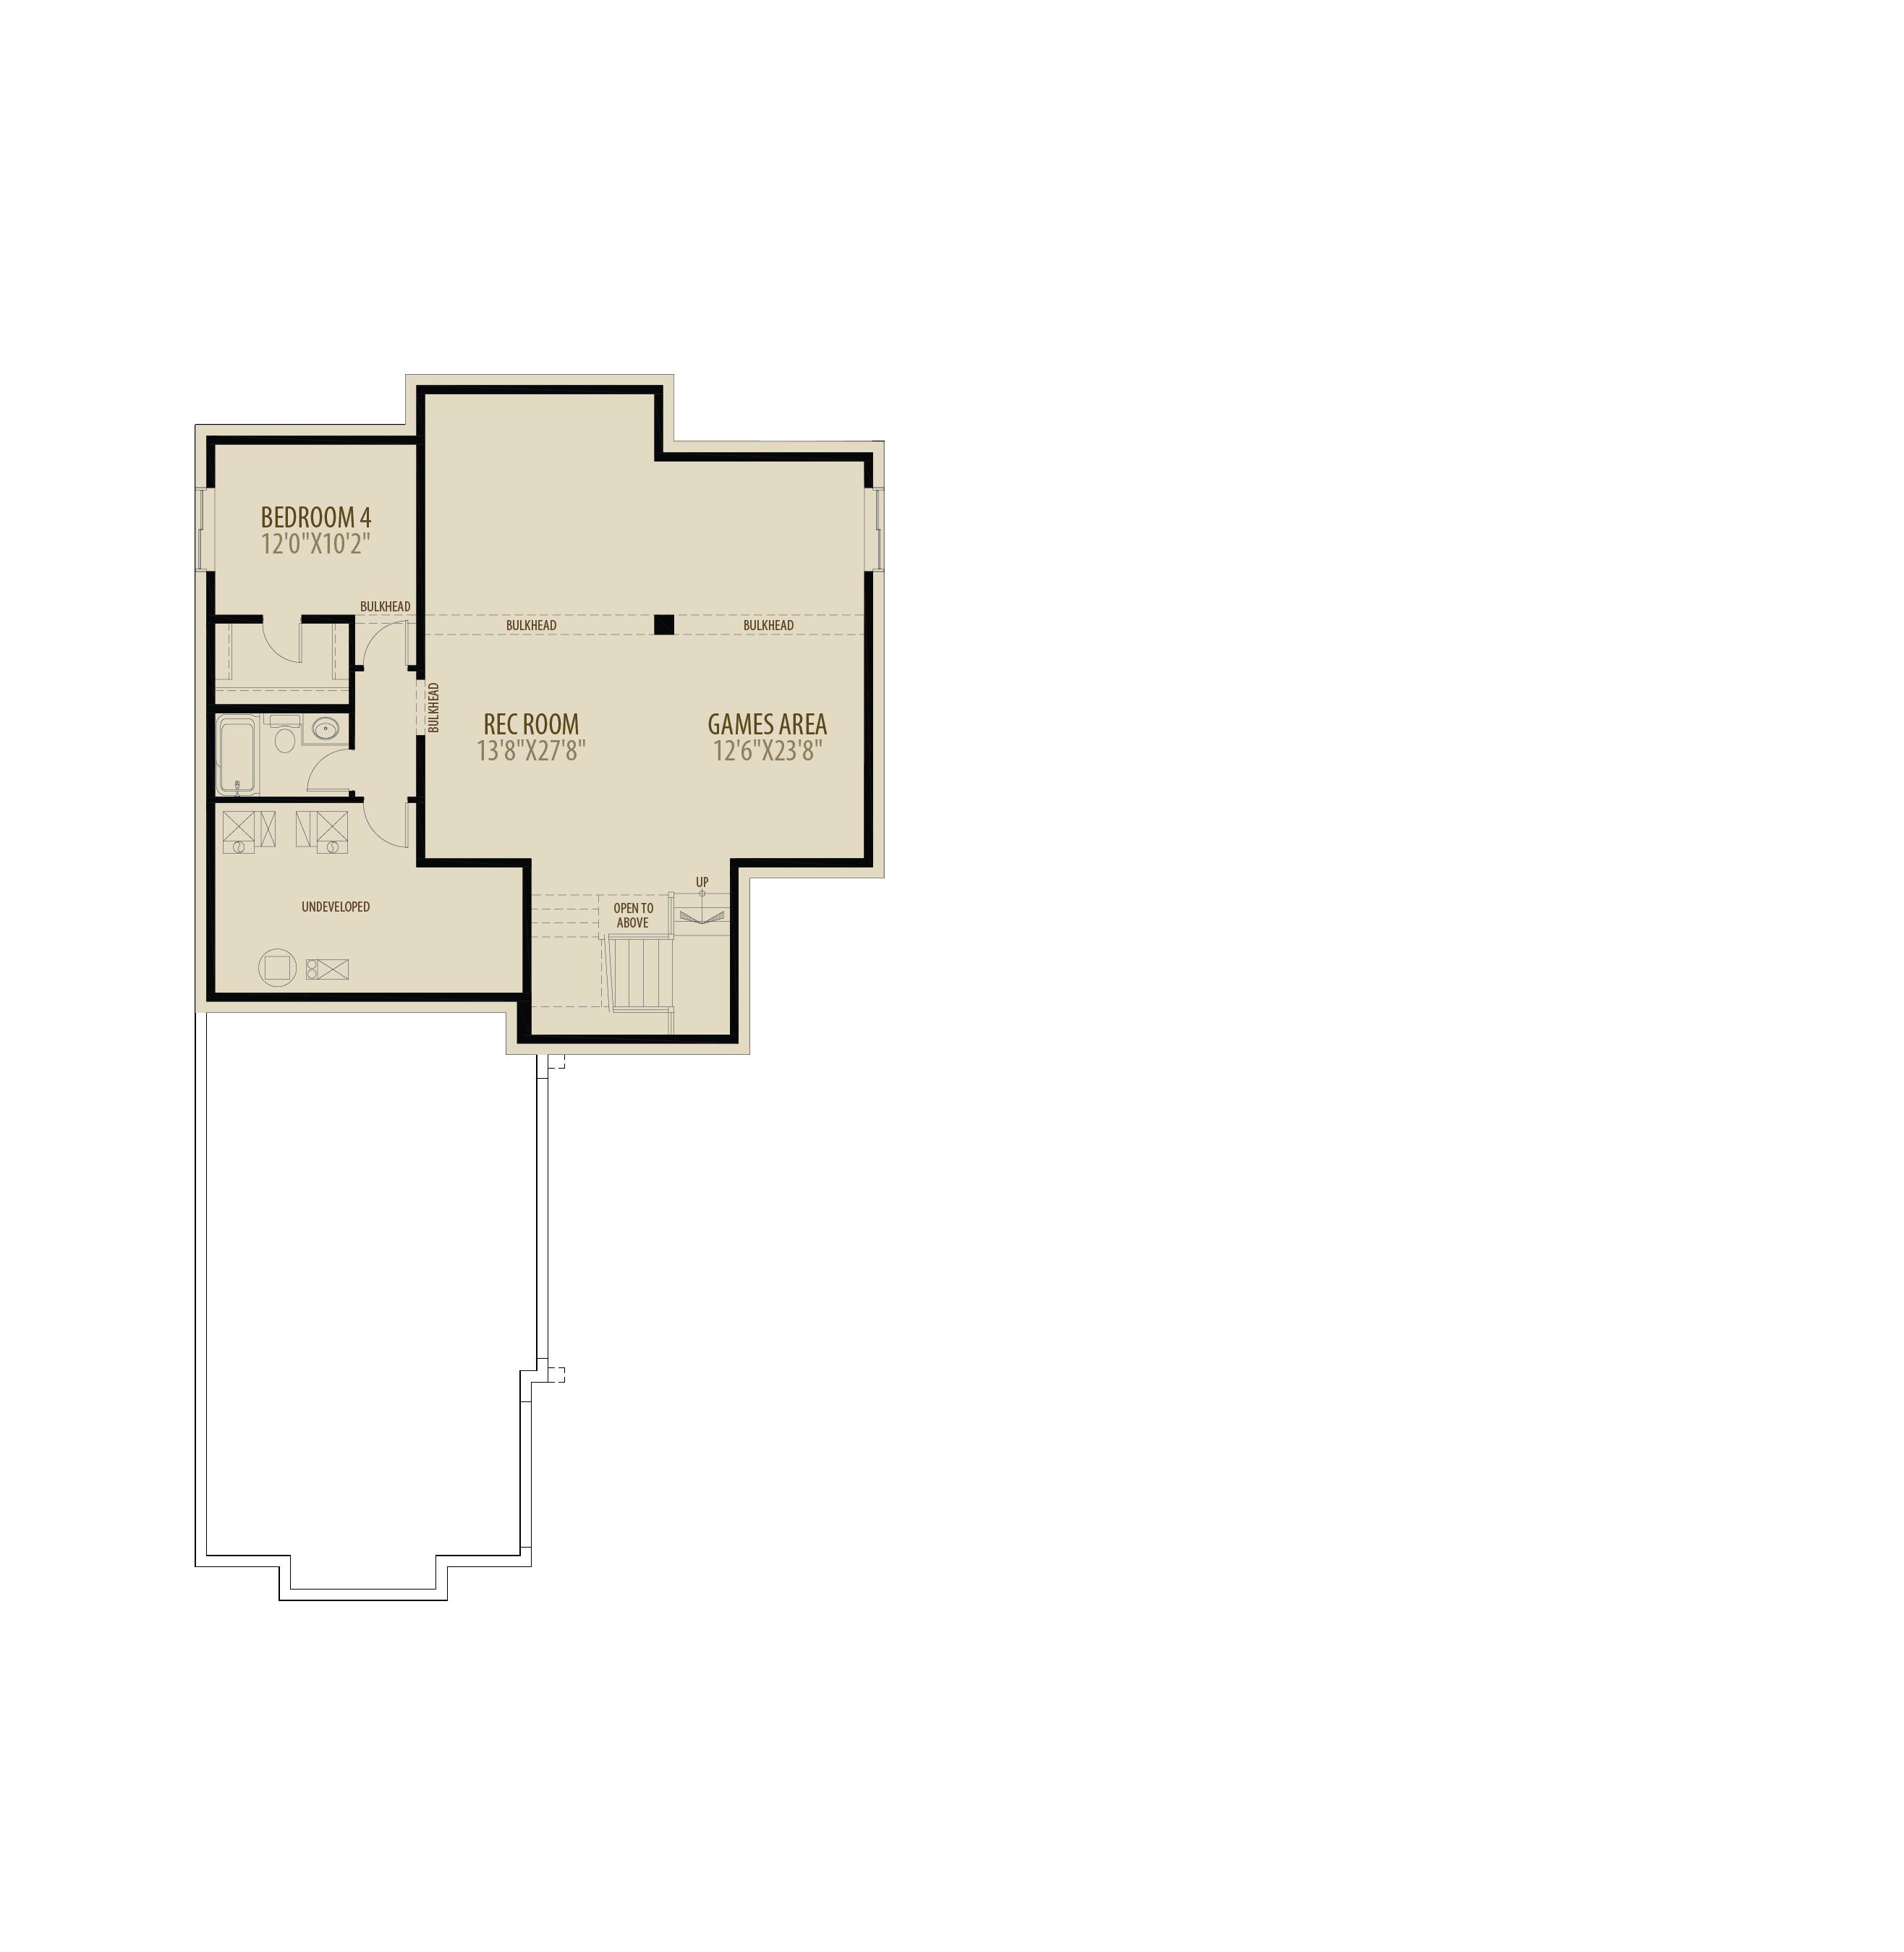 Basement 4th Bedroom, Rec Room and Games Area